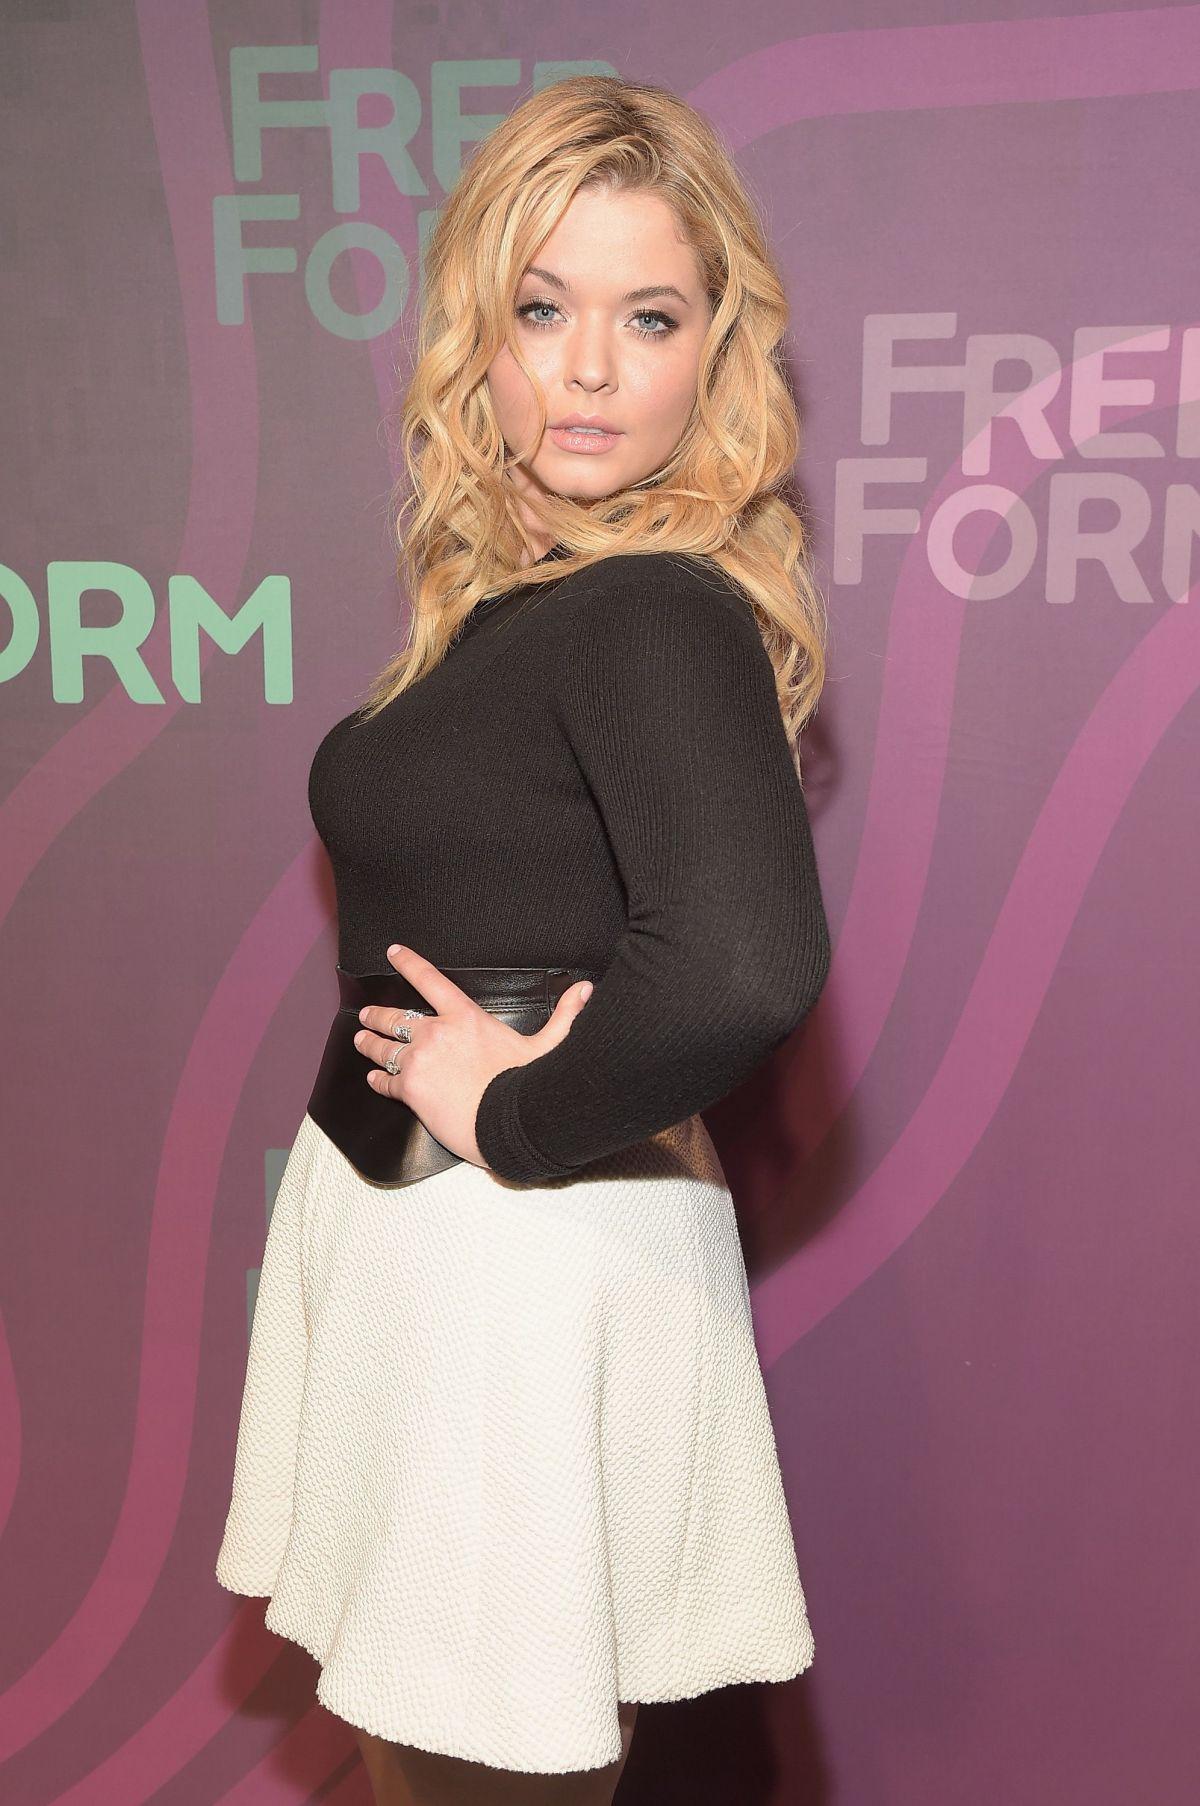 SASHA PIETERSE at 2016 ABC Freeform Upfront in New York 04/07/2016